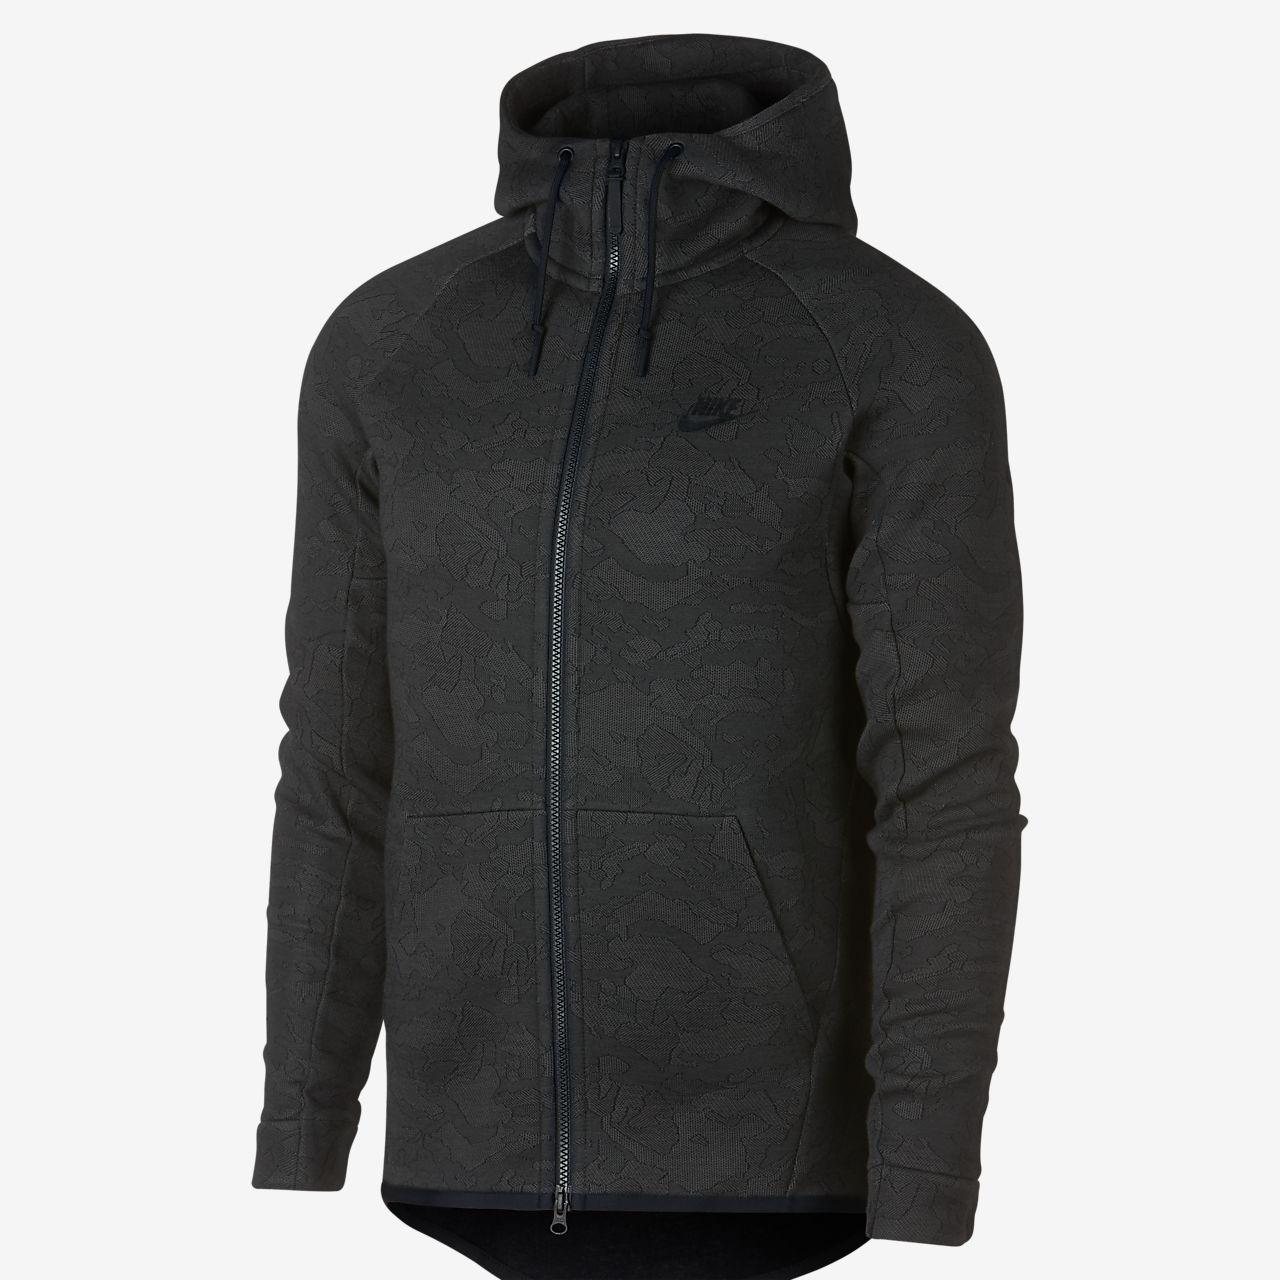 Sudadera Nike Sportswear Advance 15 FZ Fleece Negro